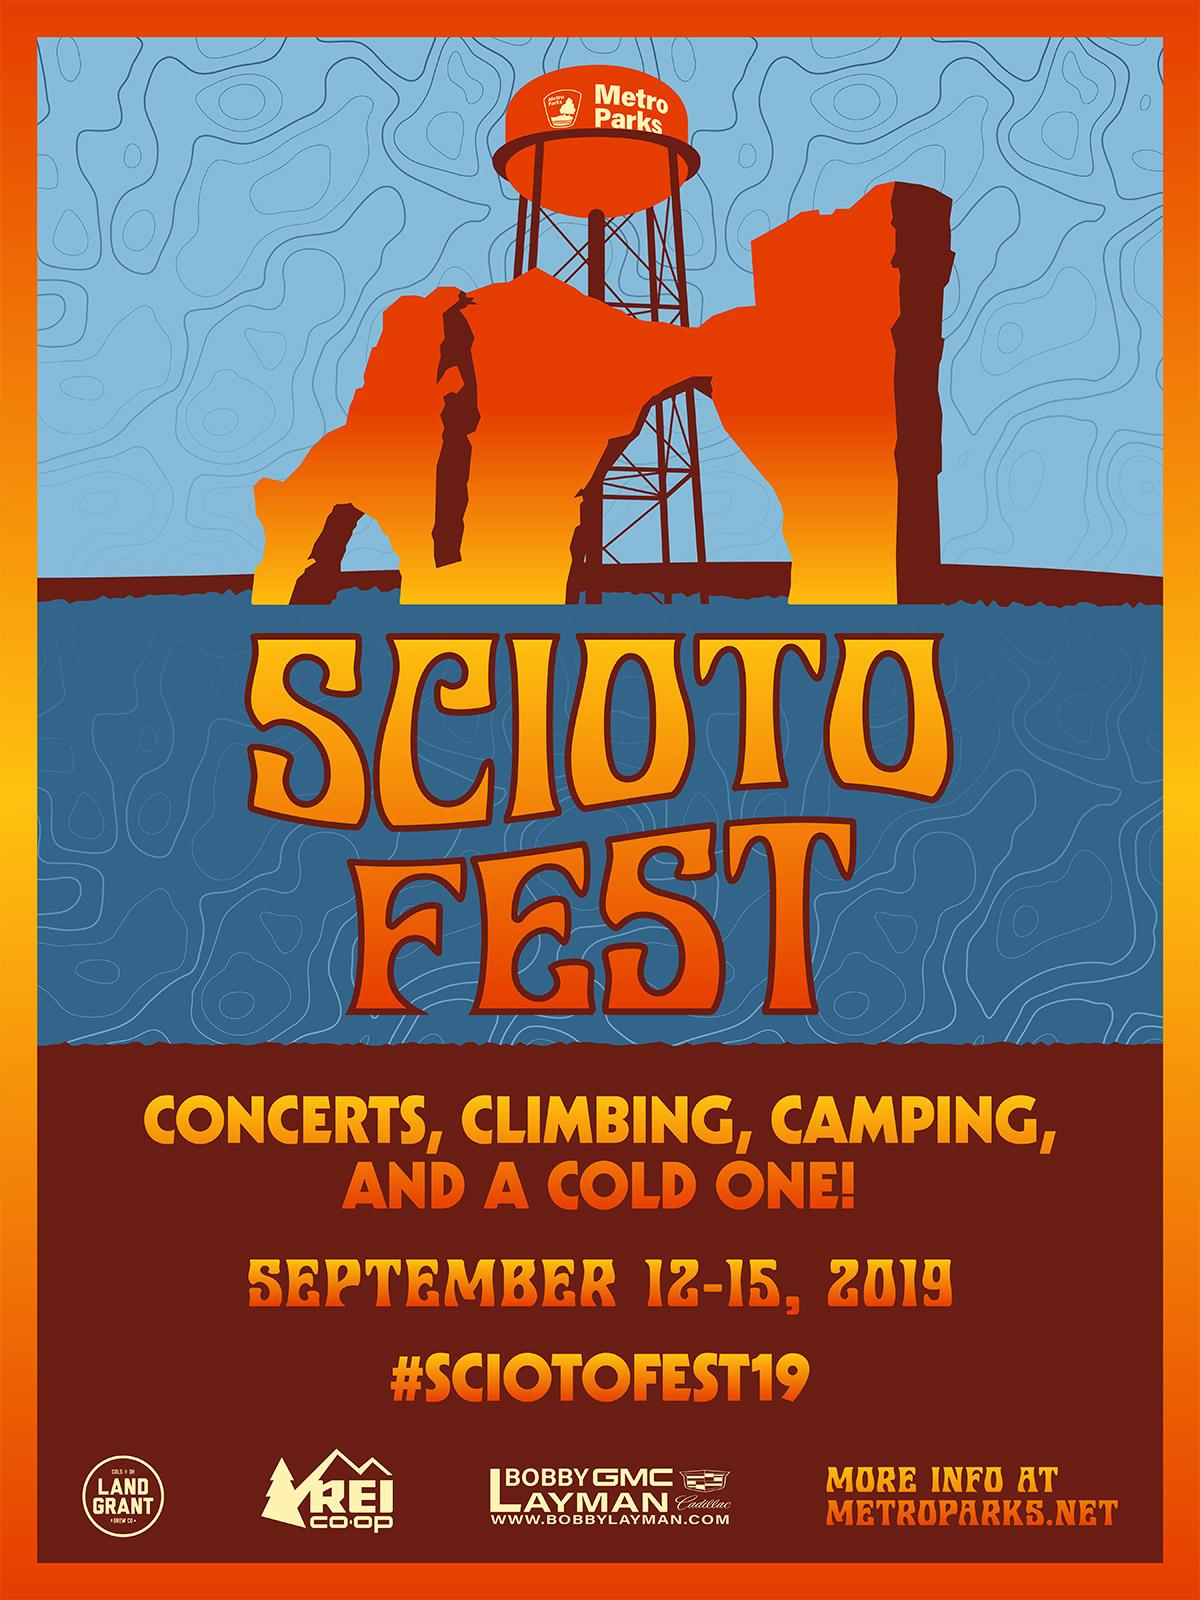 Scioto Fest 2019 Poster Information